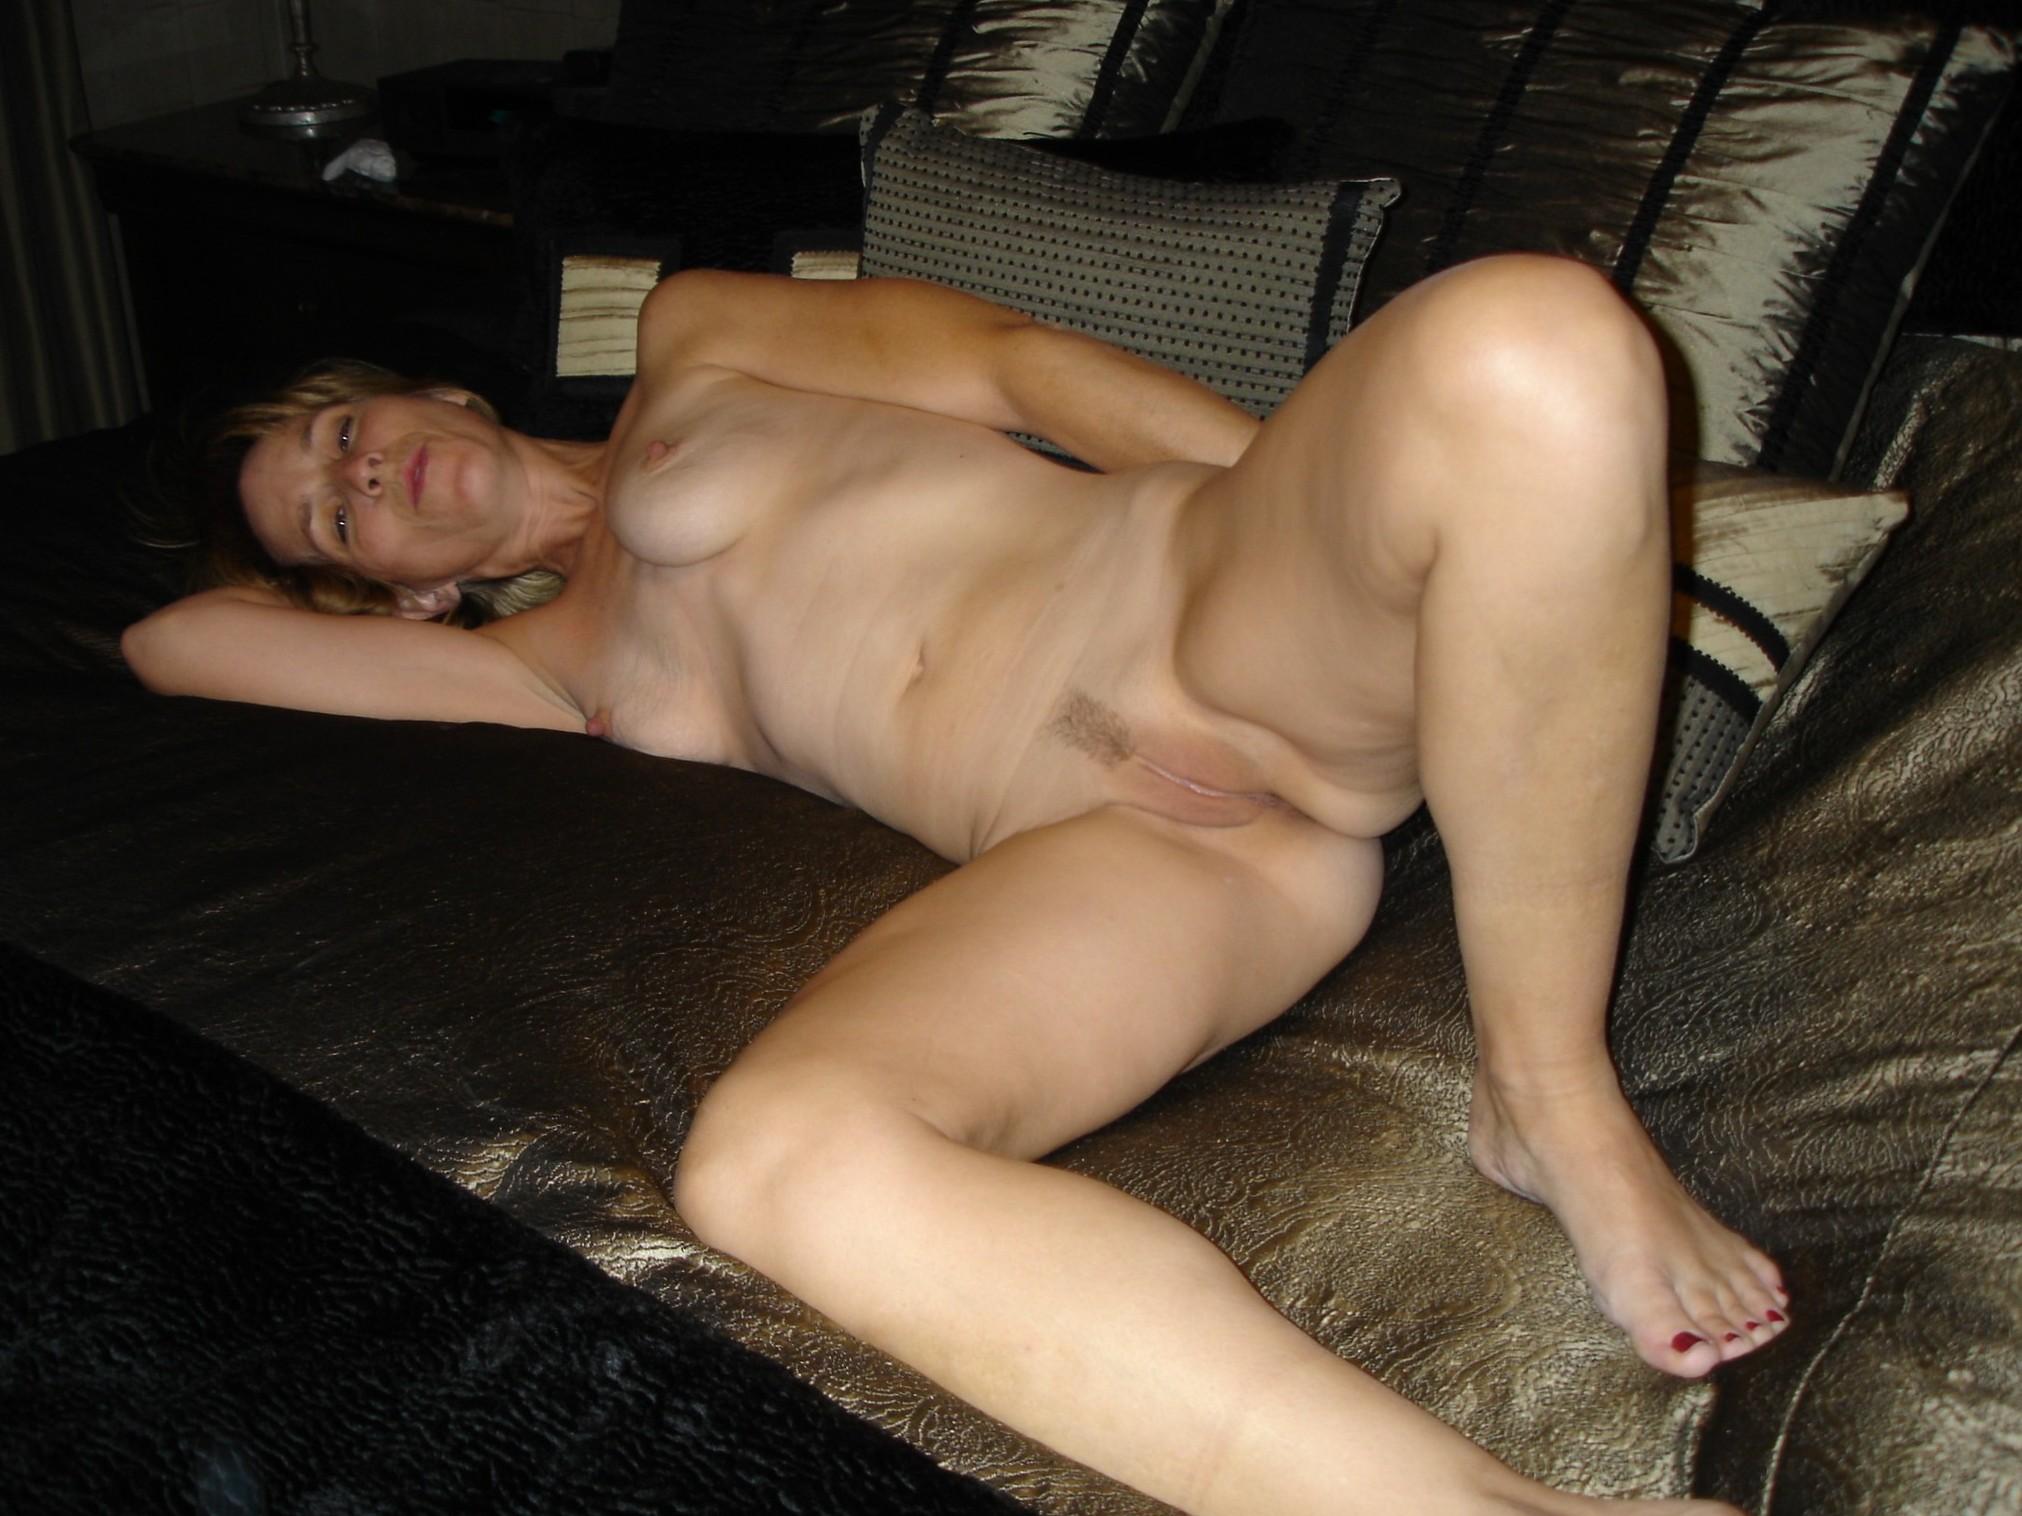 Kim likes posing naked-pussy shot